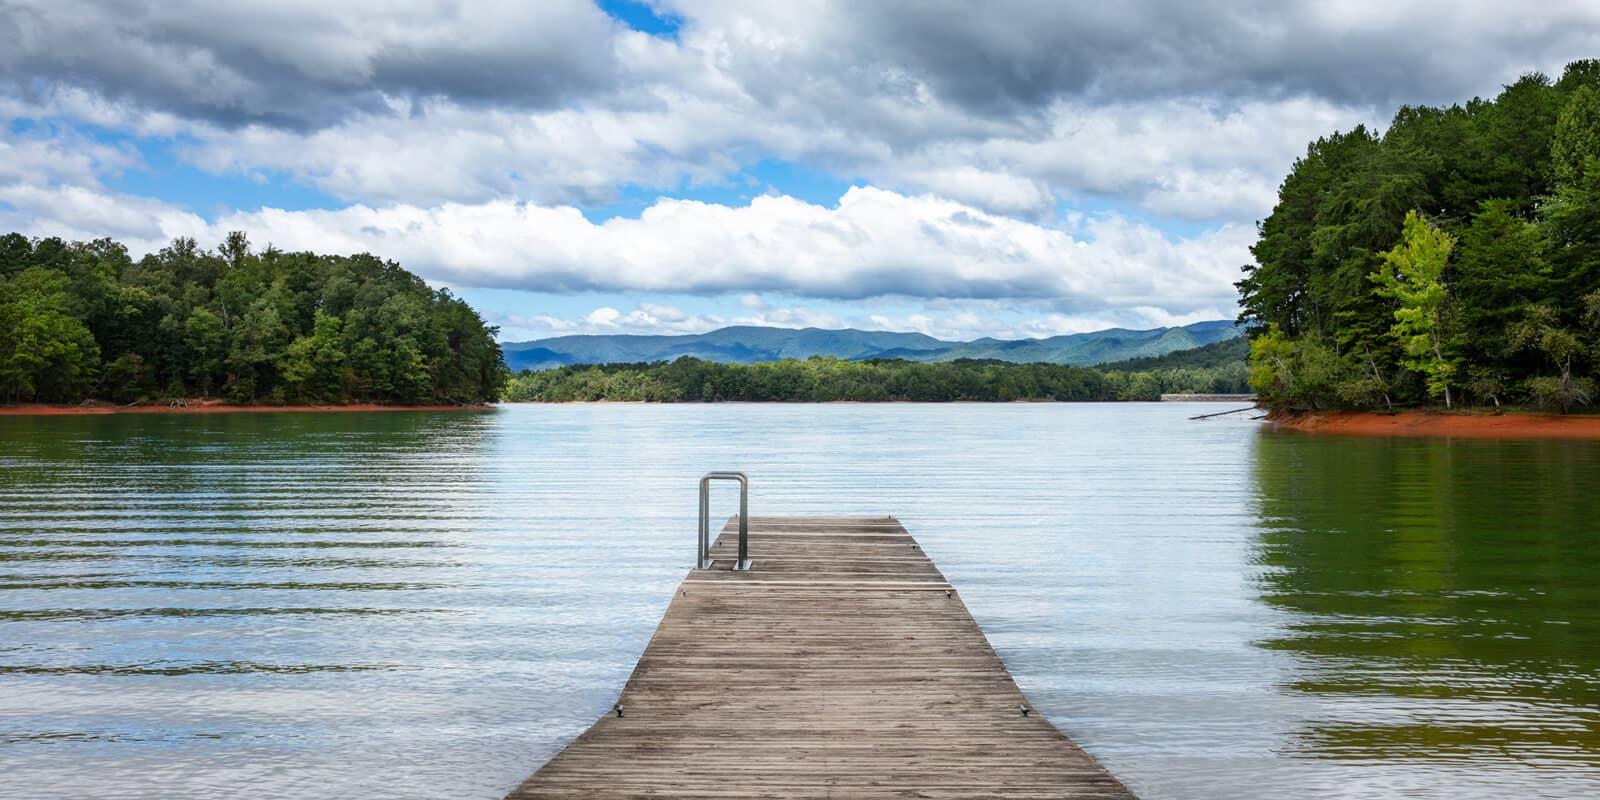 Hiwassee Lake in North Carolina